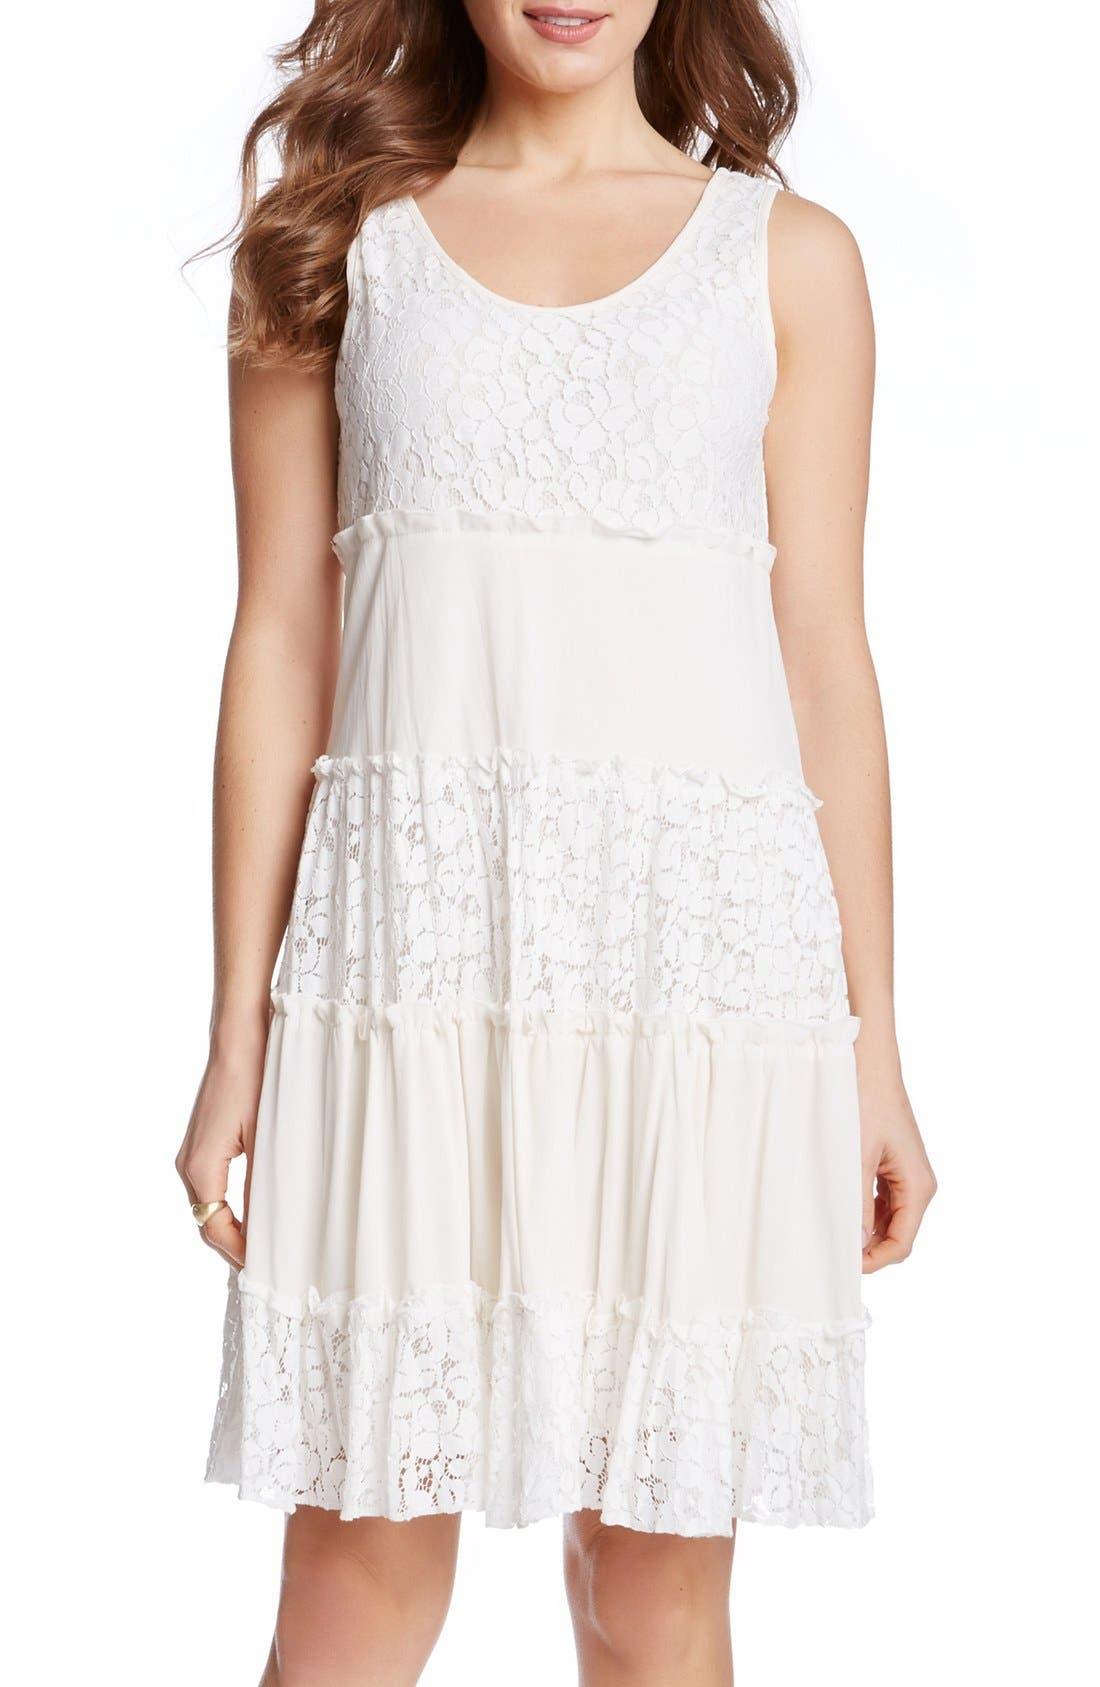 Alternate Image 1 Selected - Karen Kane 'Tara' Tiered Lace A-Line Dress